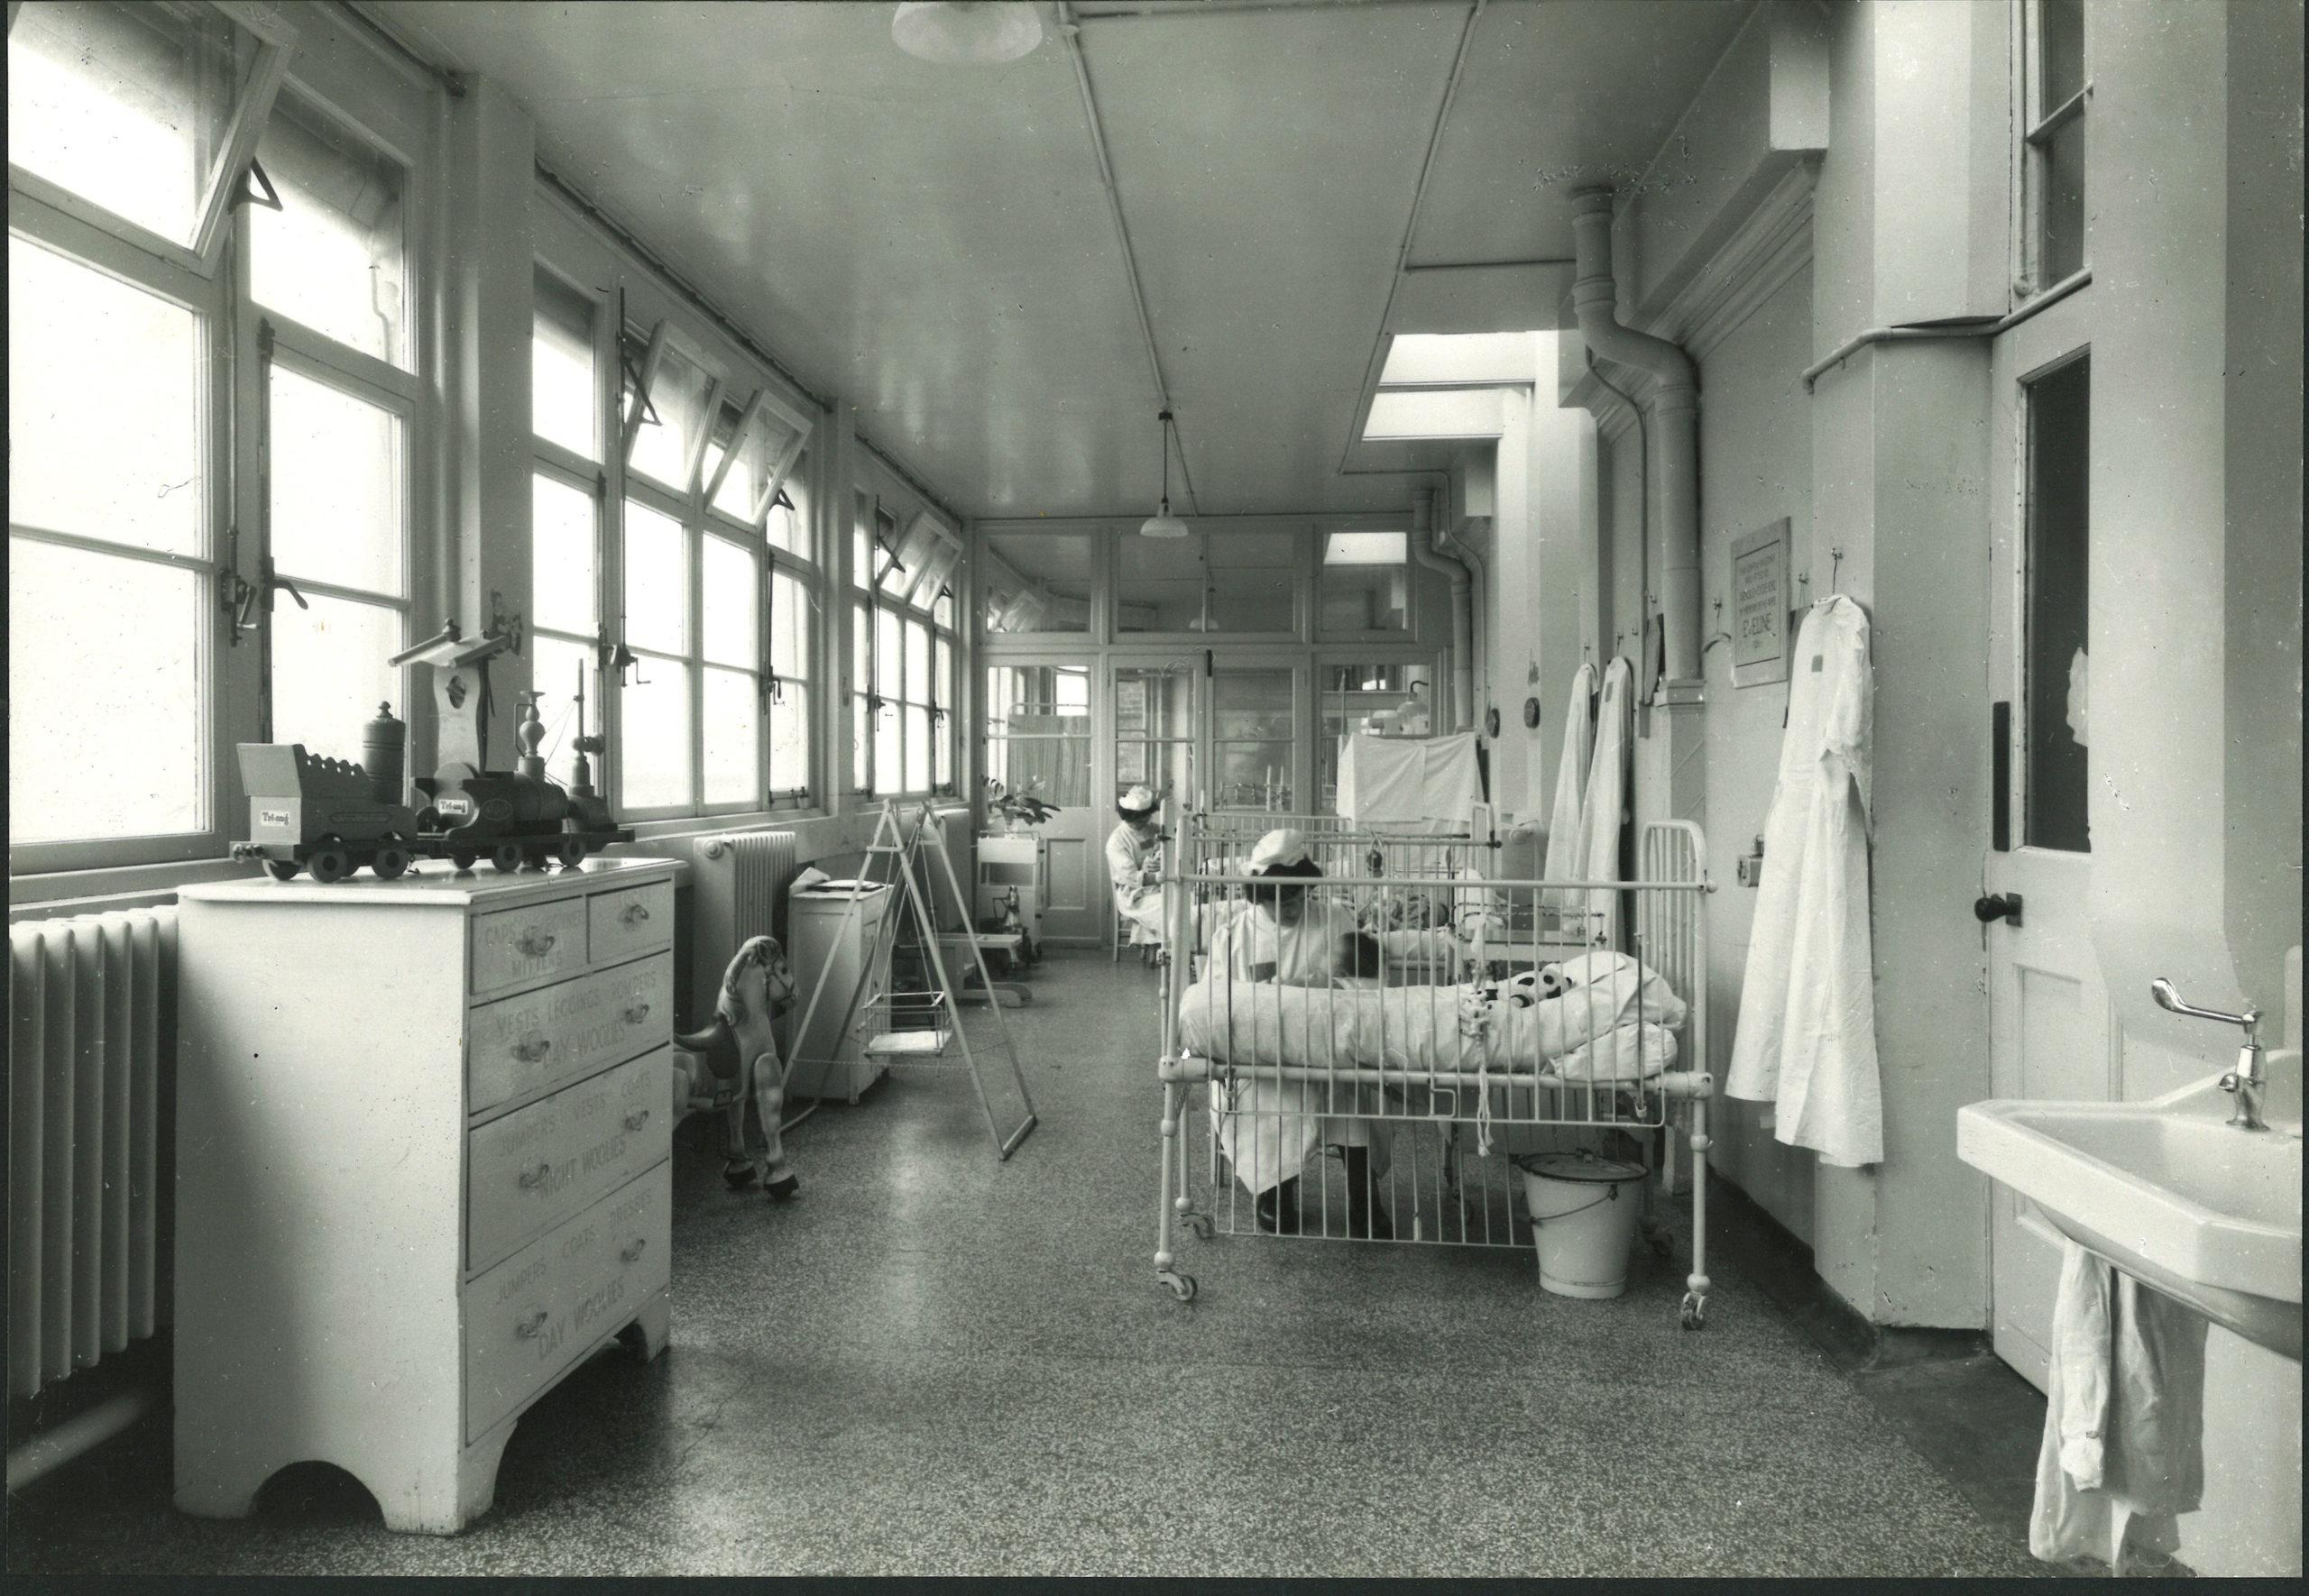 Paediatric ward, Royal Alexandra Hospital, 1920s